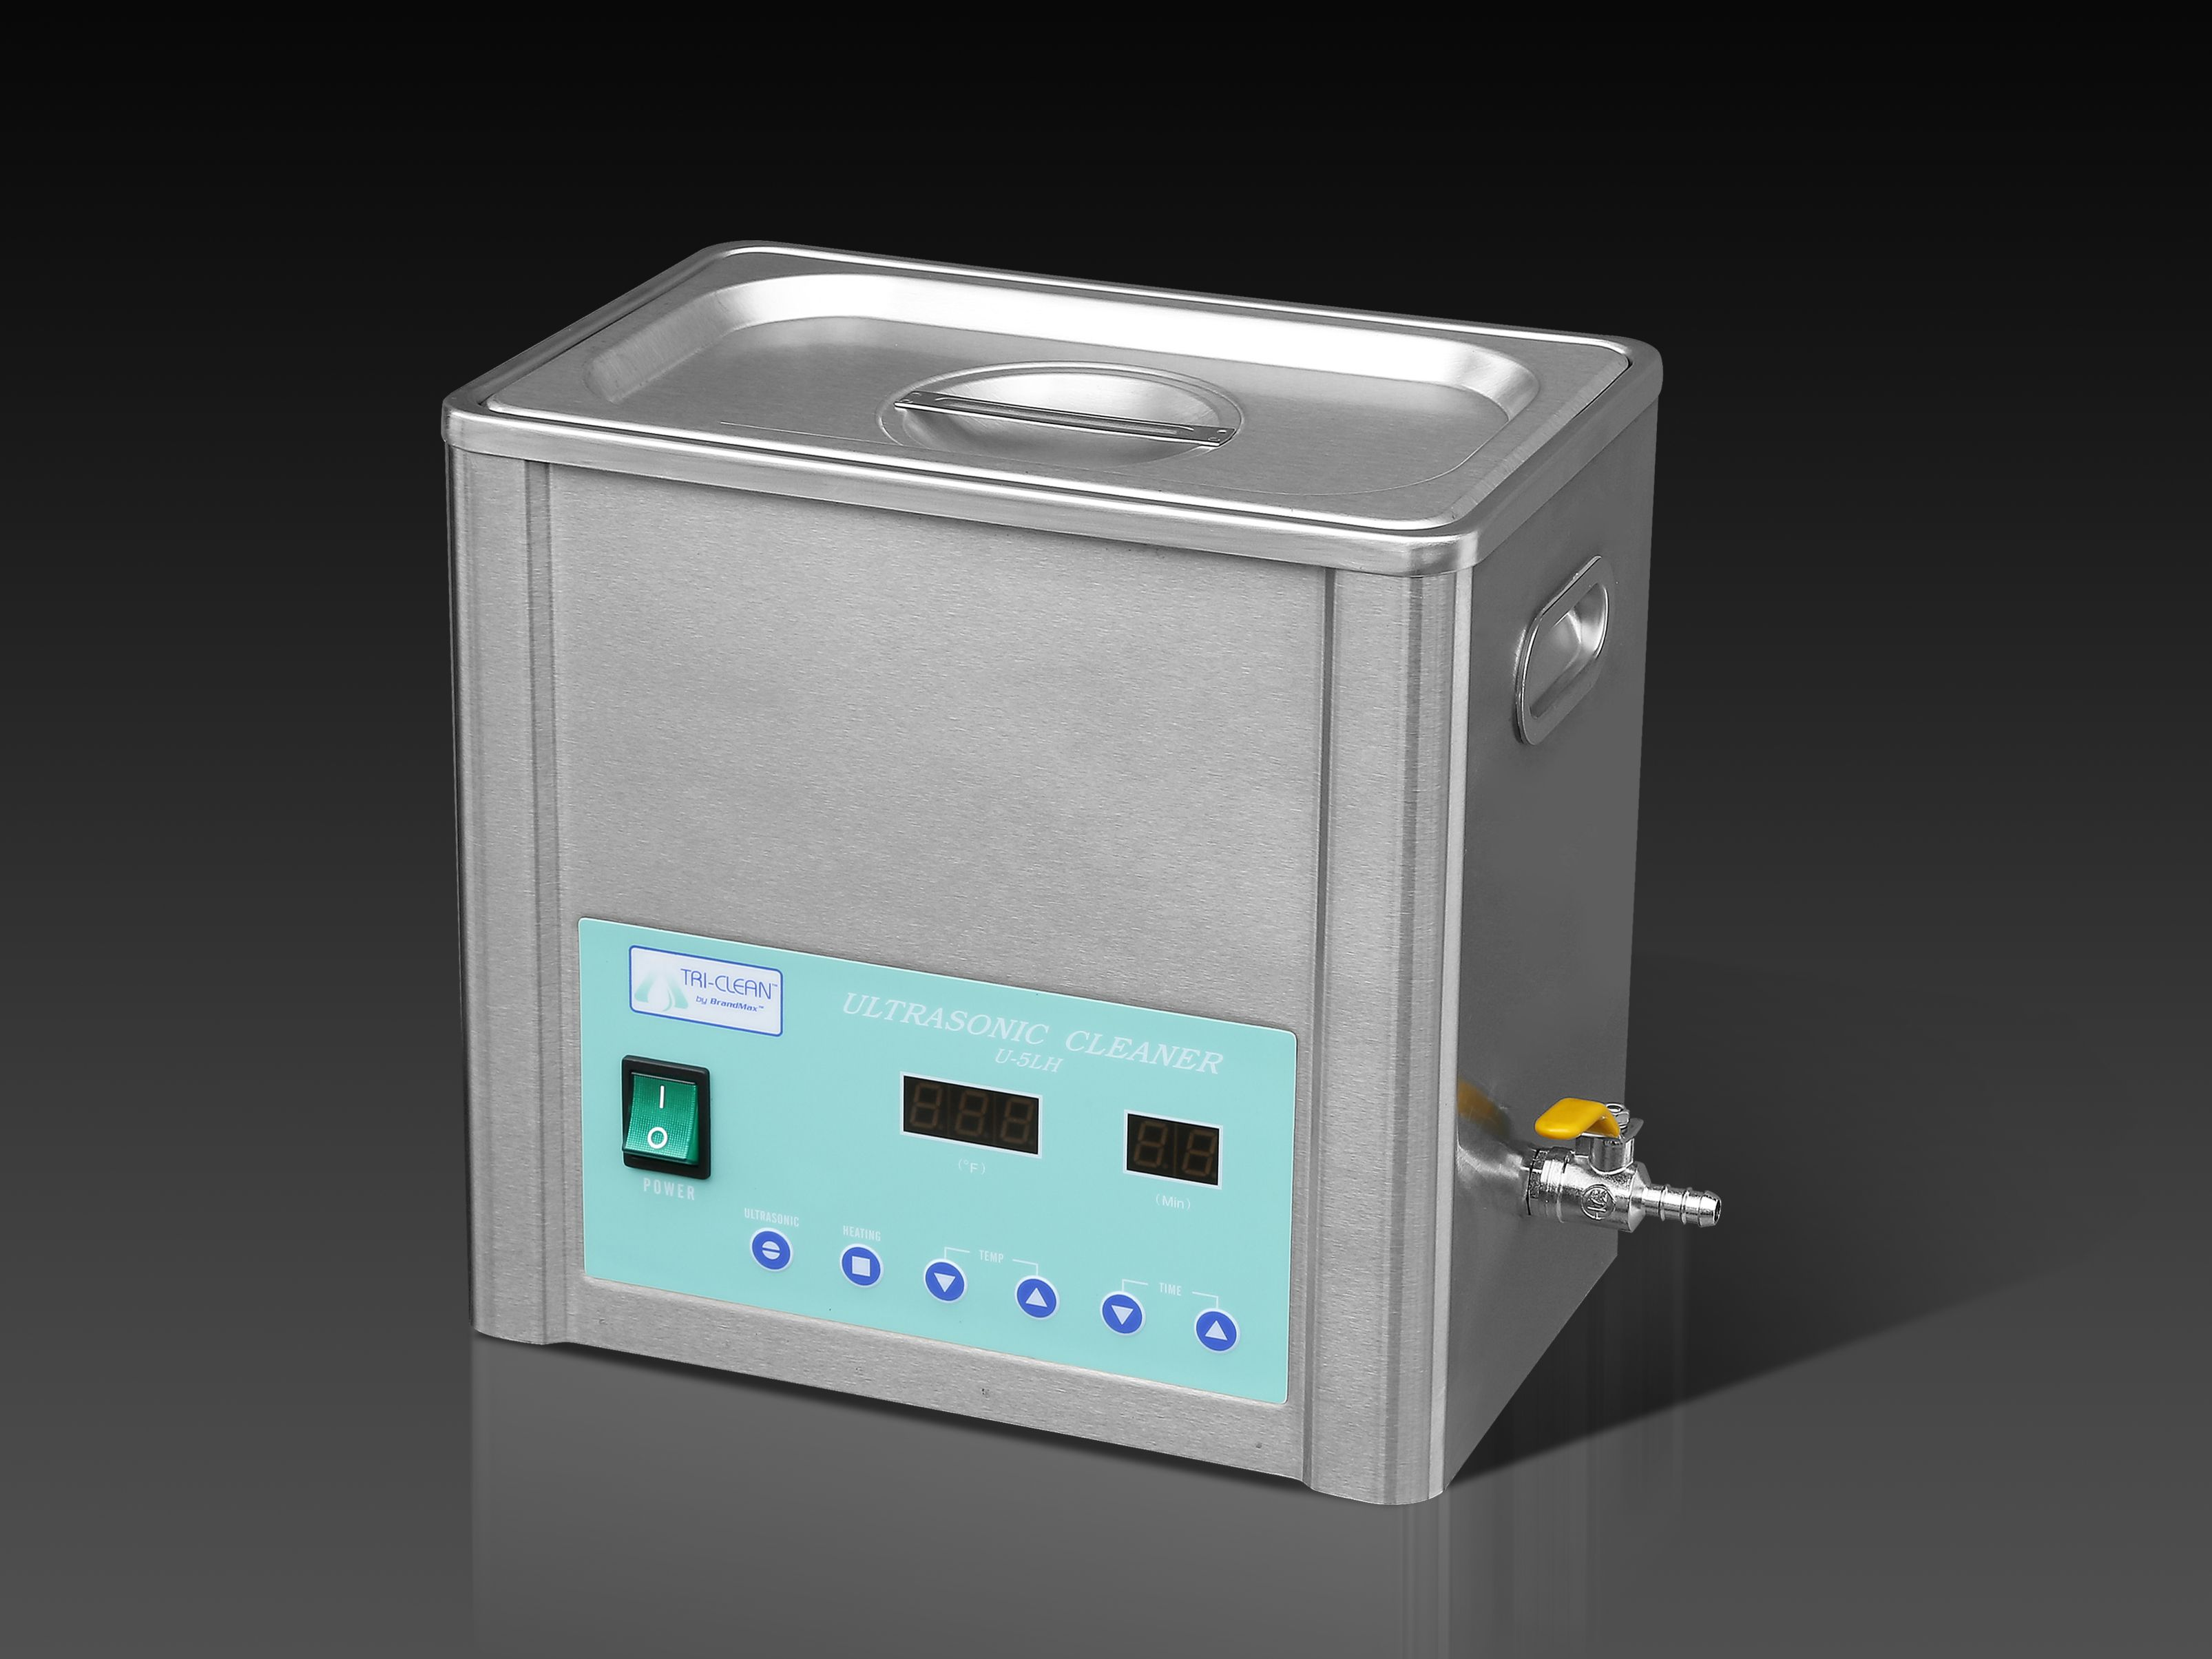 Brandmax Tri Clean U 5lh Ultrasonic Cleaner Free Basket And Products Generators Generator Circuit Heat Always Included Best Unit